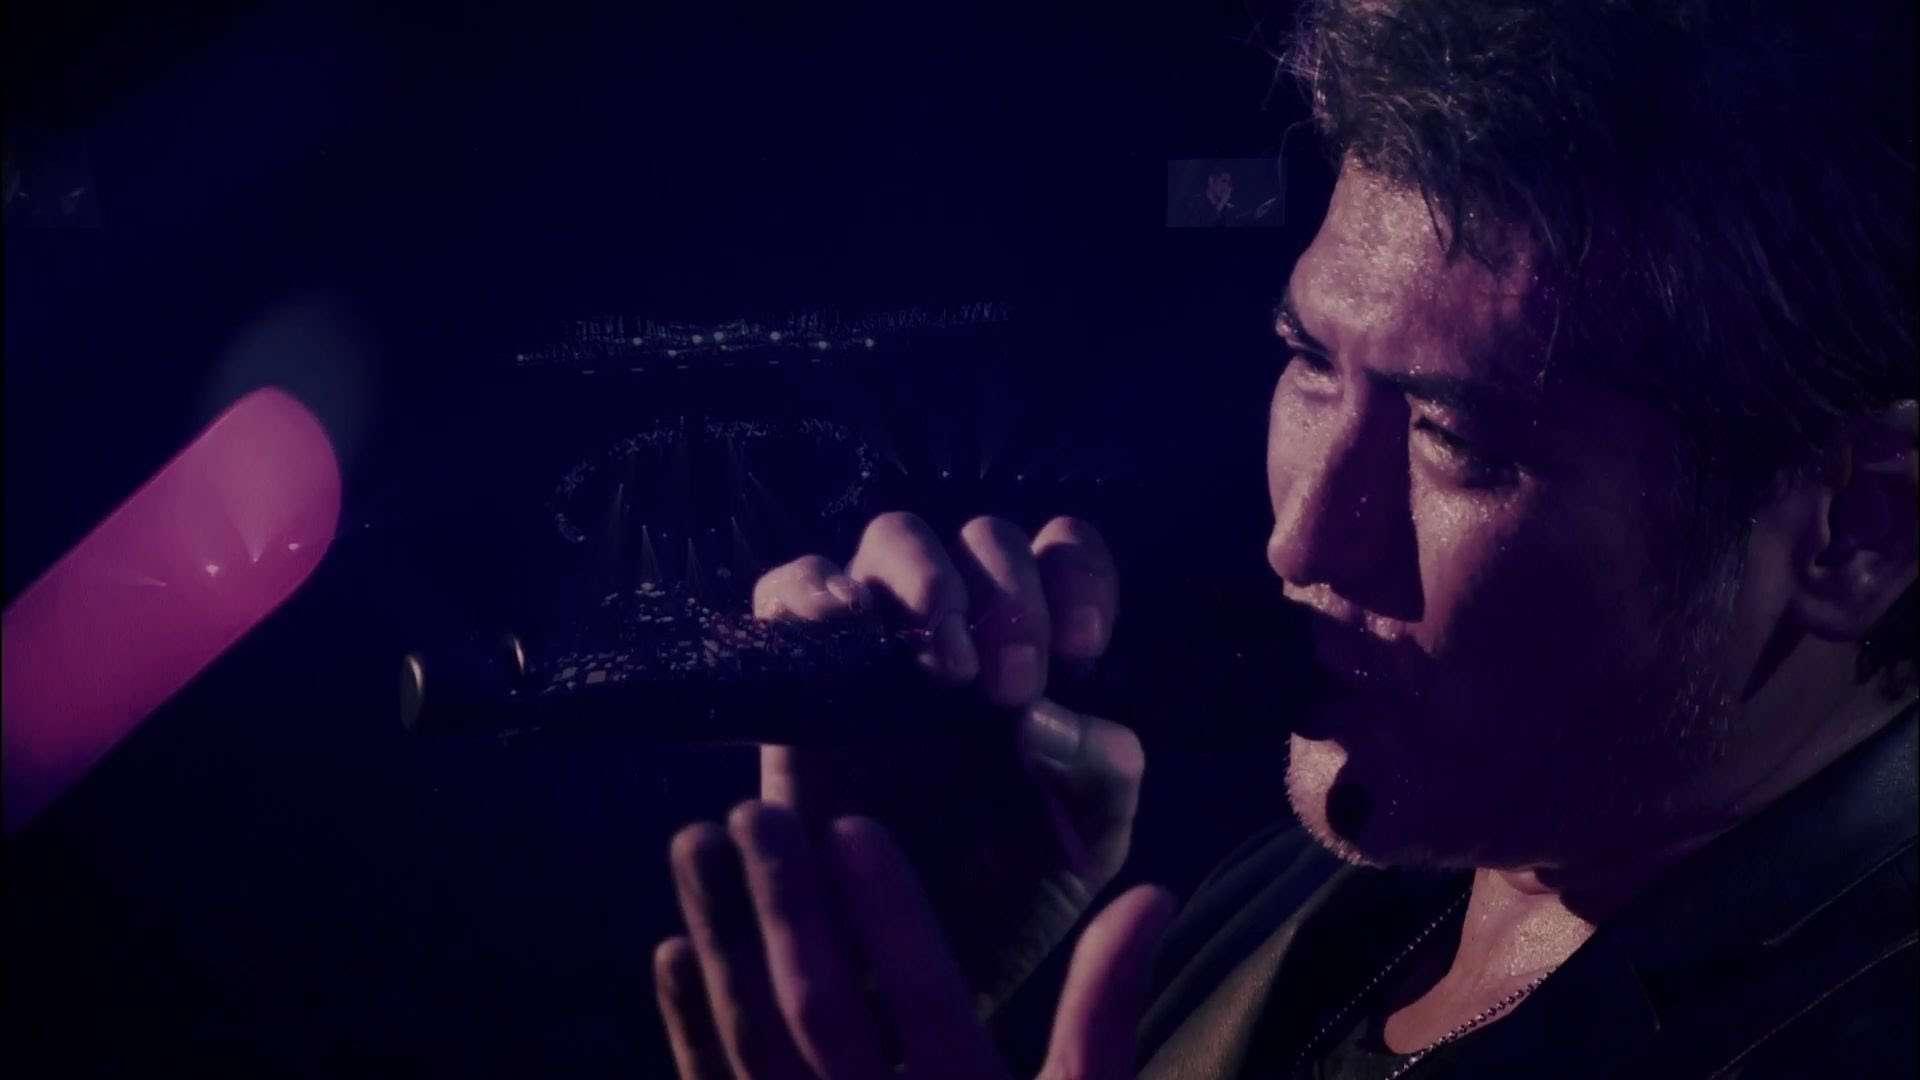 吉川晃司 - すべてはこの夜に - SUBETE WA KONO YORU NI ~KOJI KIKKAWA LIVE@NIPPON BUDOKAN 2014 TOKYO - YouTube